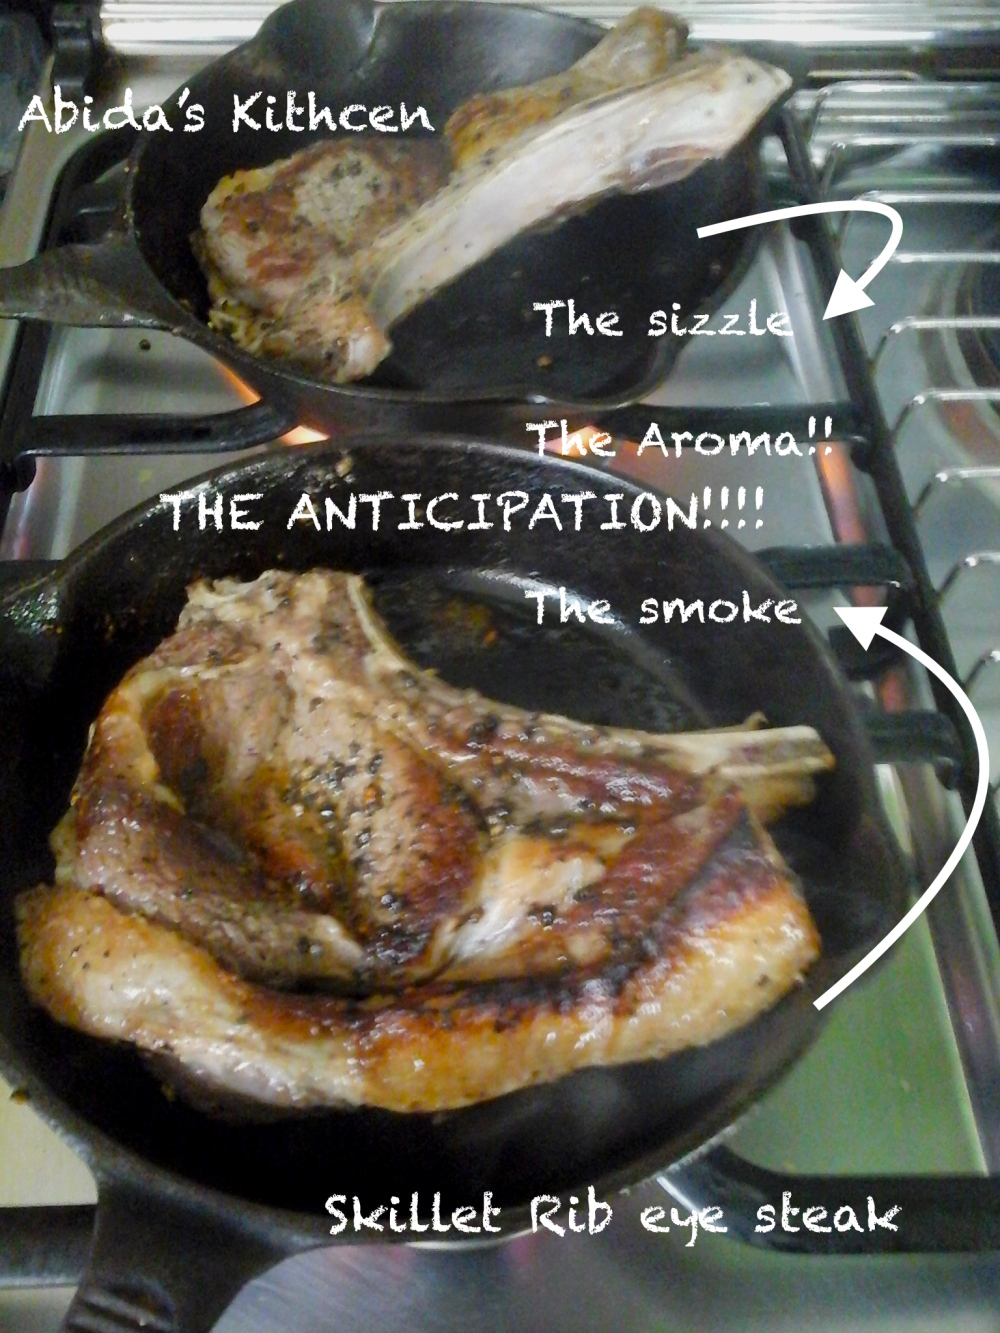 Iron Skillet Rib Eye Steak with a Basalmic Orange Vinegar Reduction